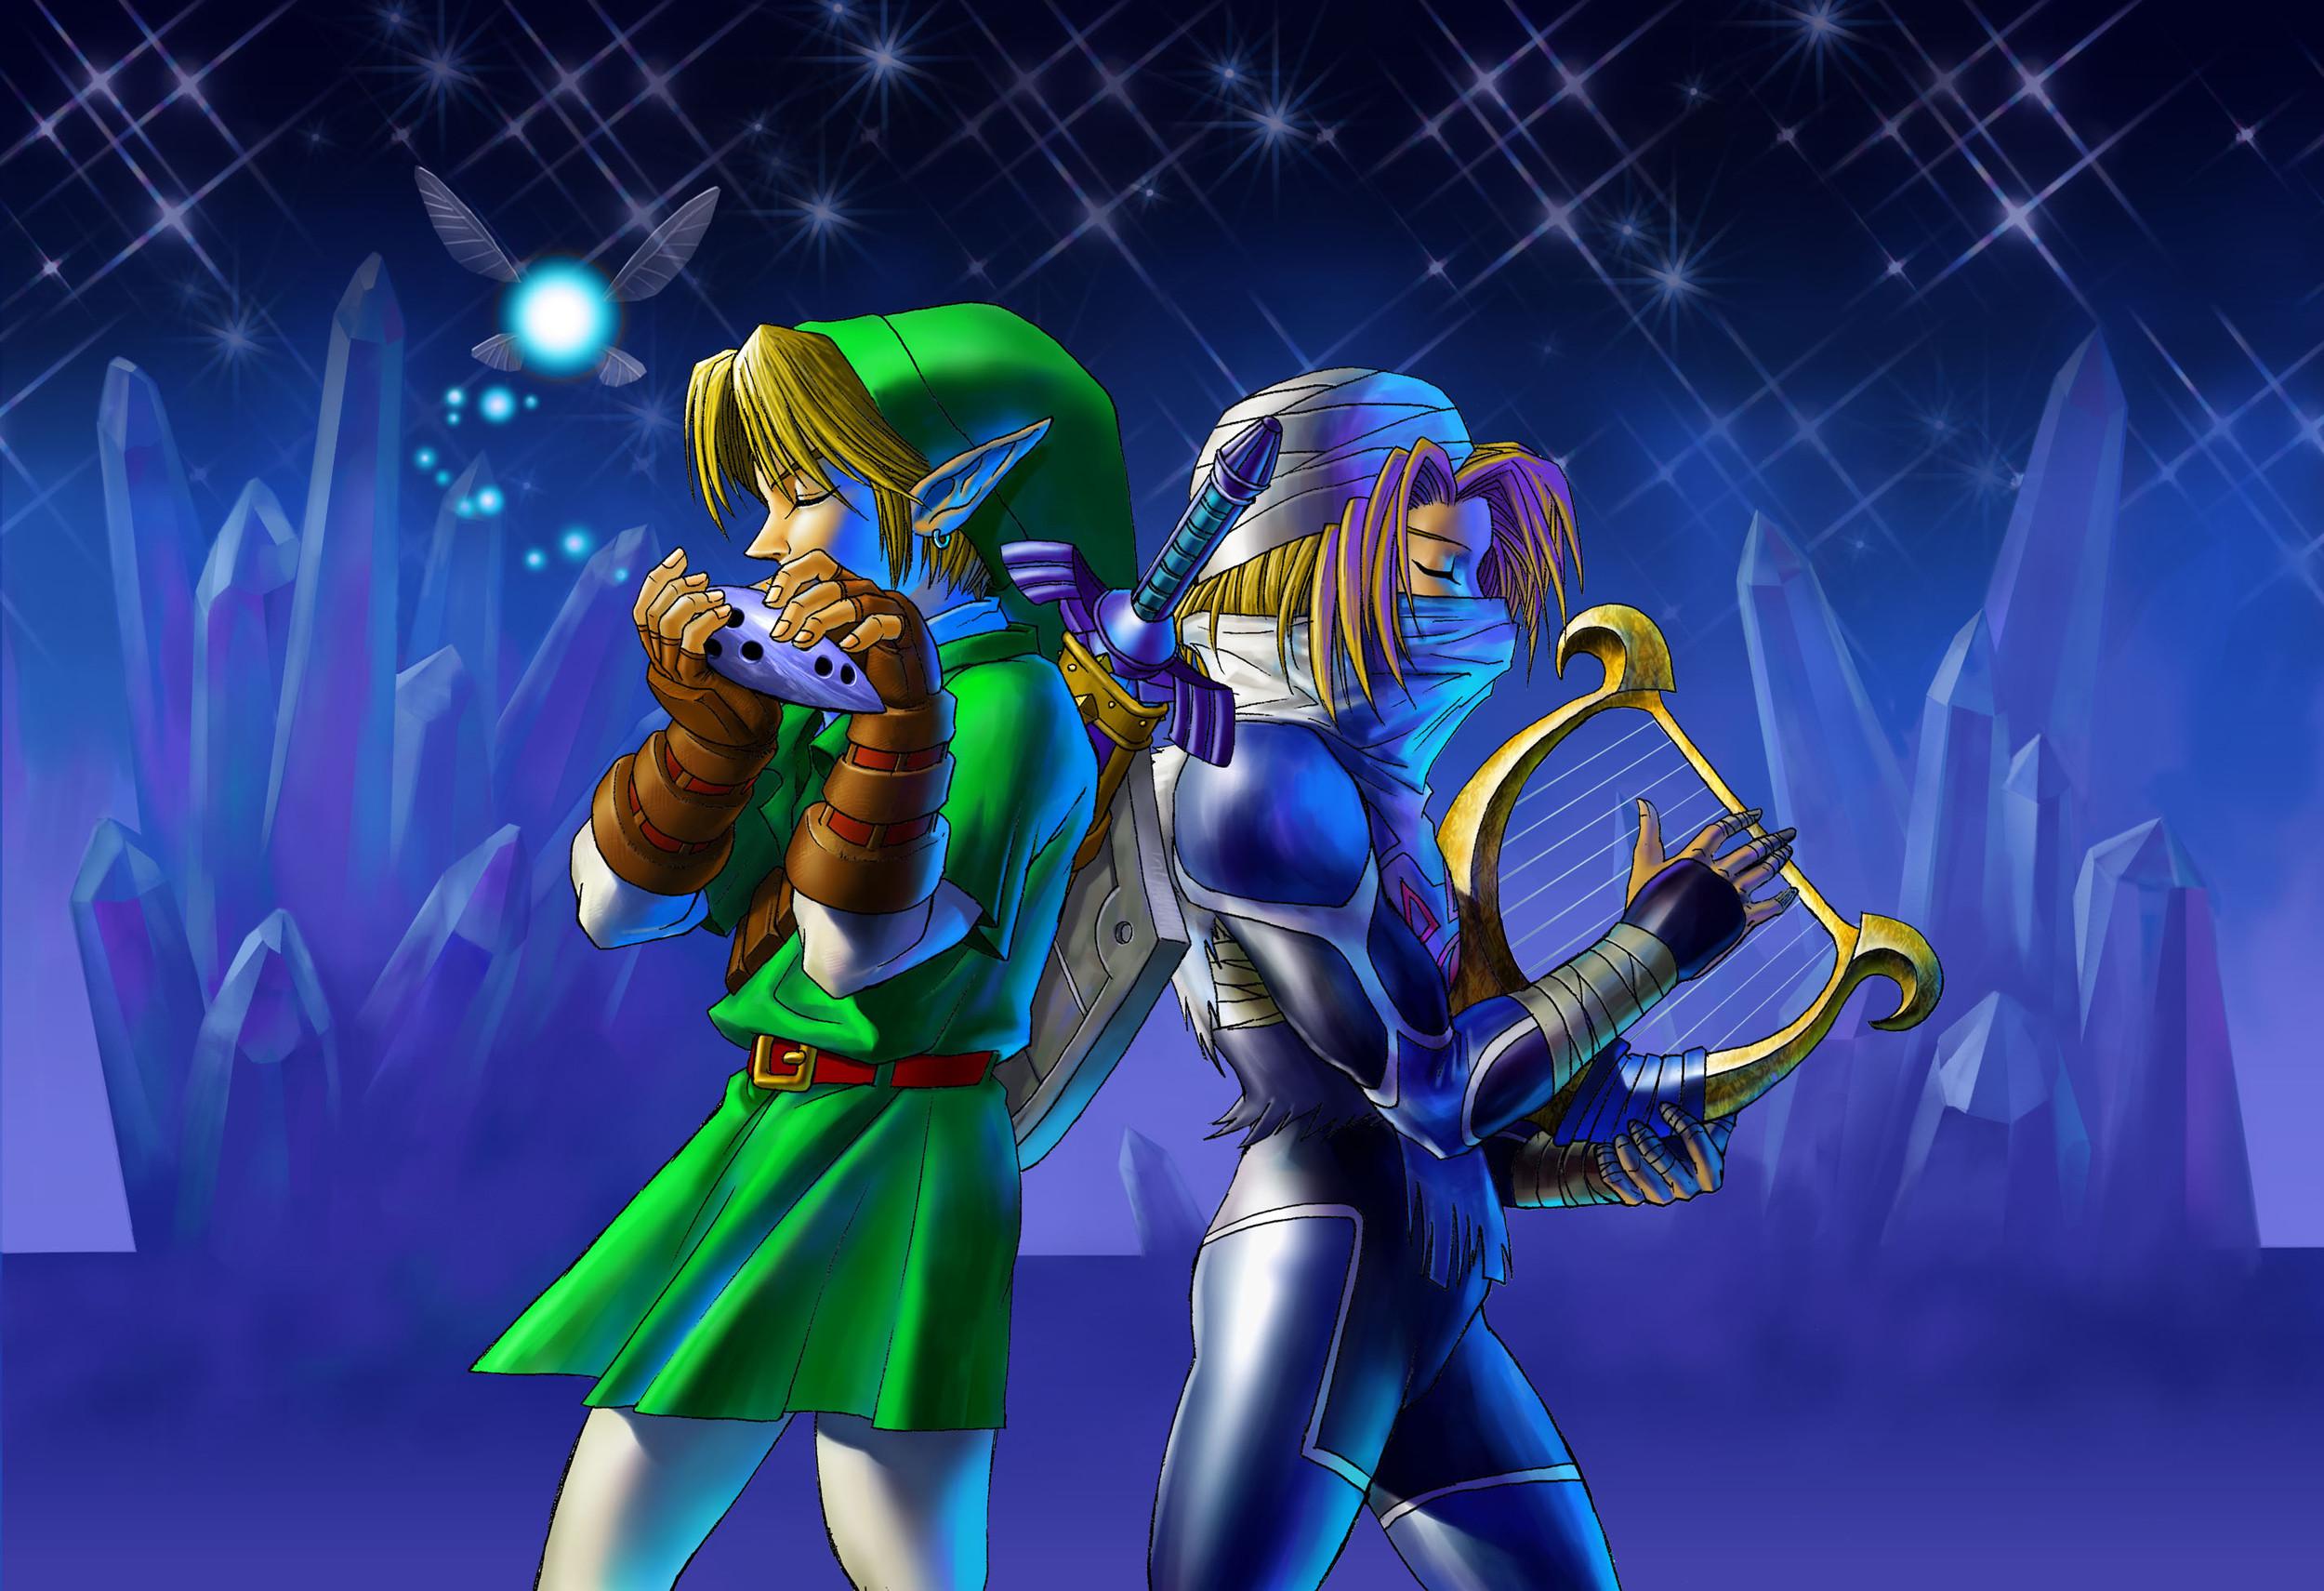 Legend Of Zelda Ocarina Of Time Wallpapers High Definition For Desktop  Wallpaper 2500 x 1711 px